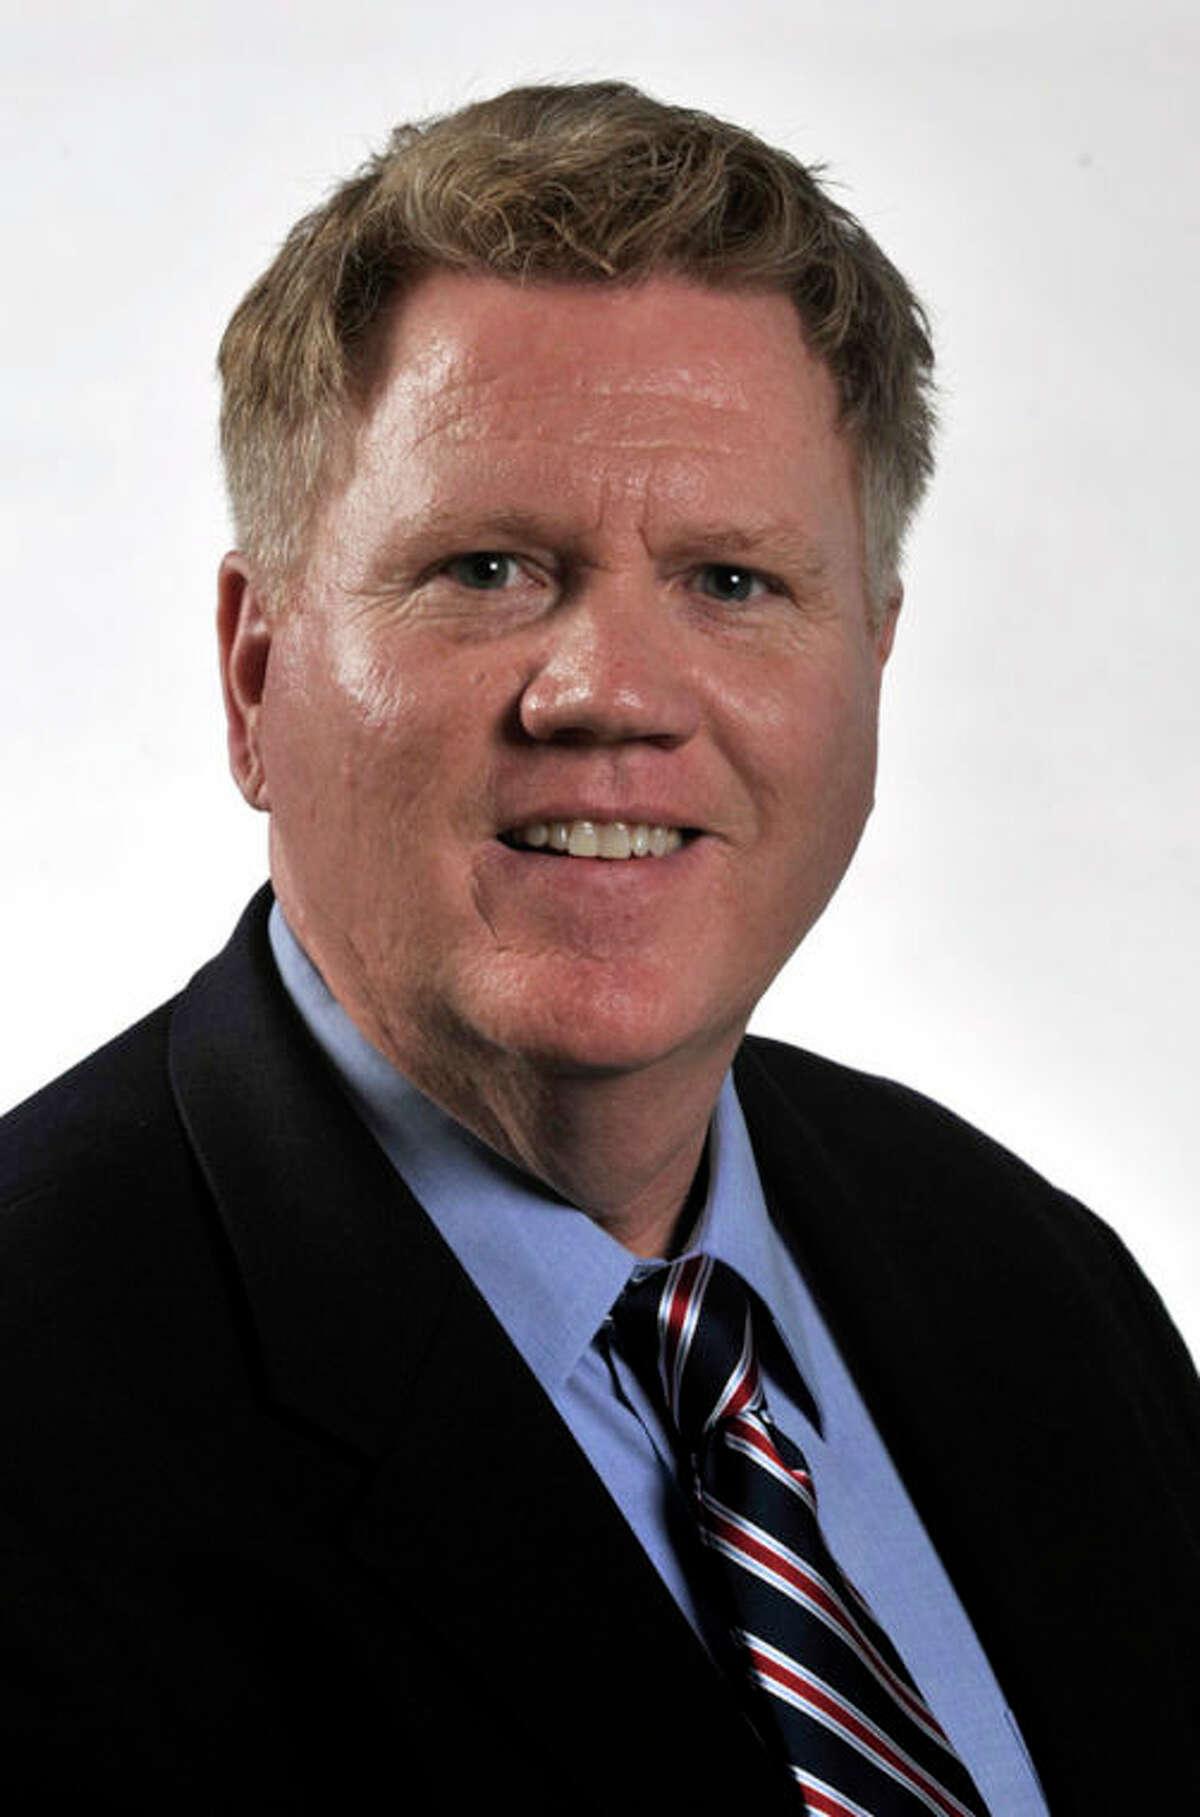 Stephen Spillman / Amarillo Globe-News Michael Distelhorst Wednesday, July 7, 2010.